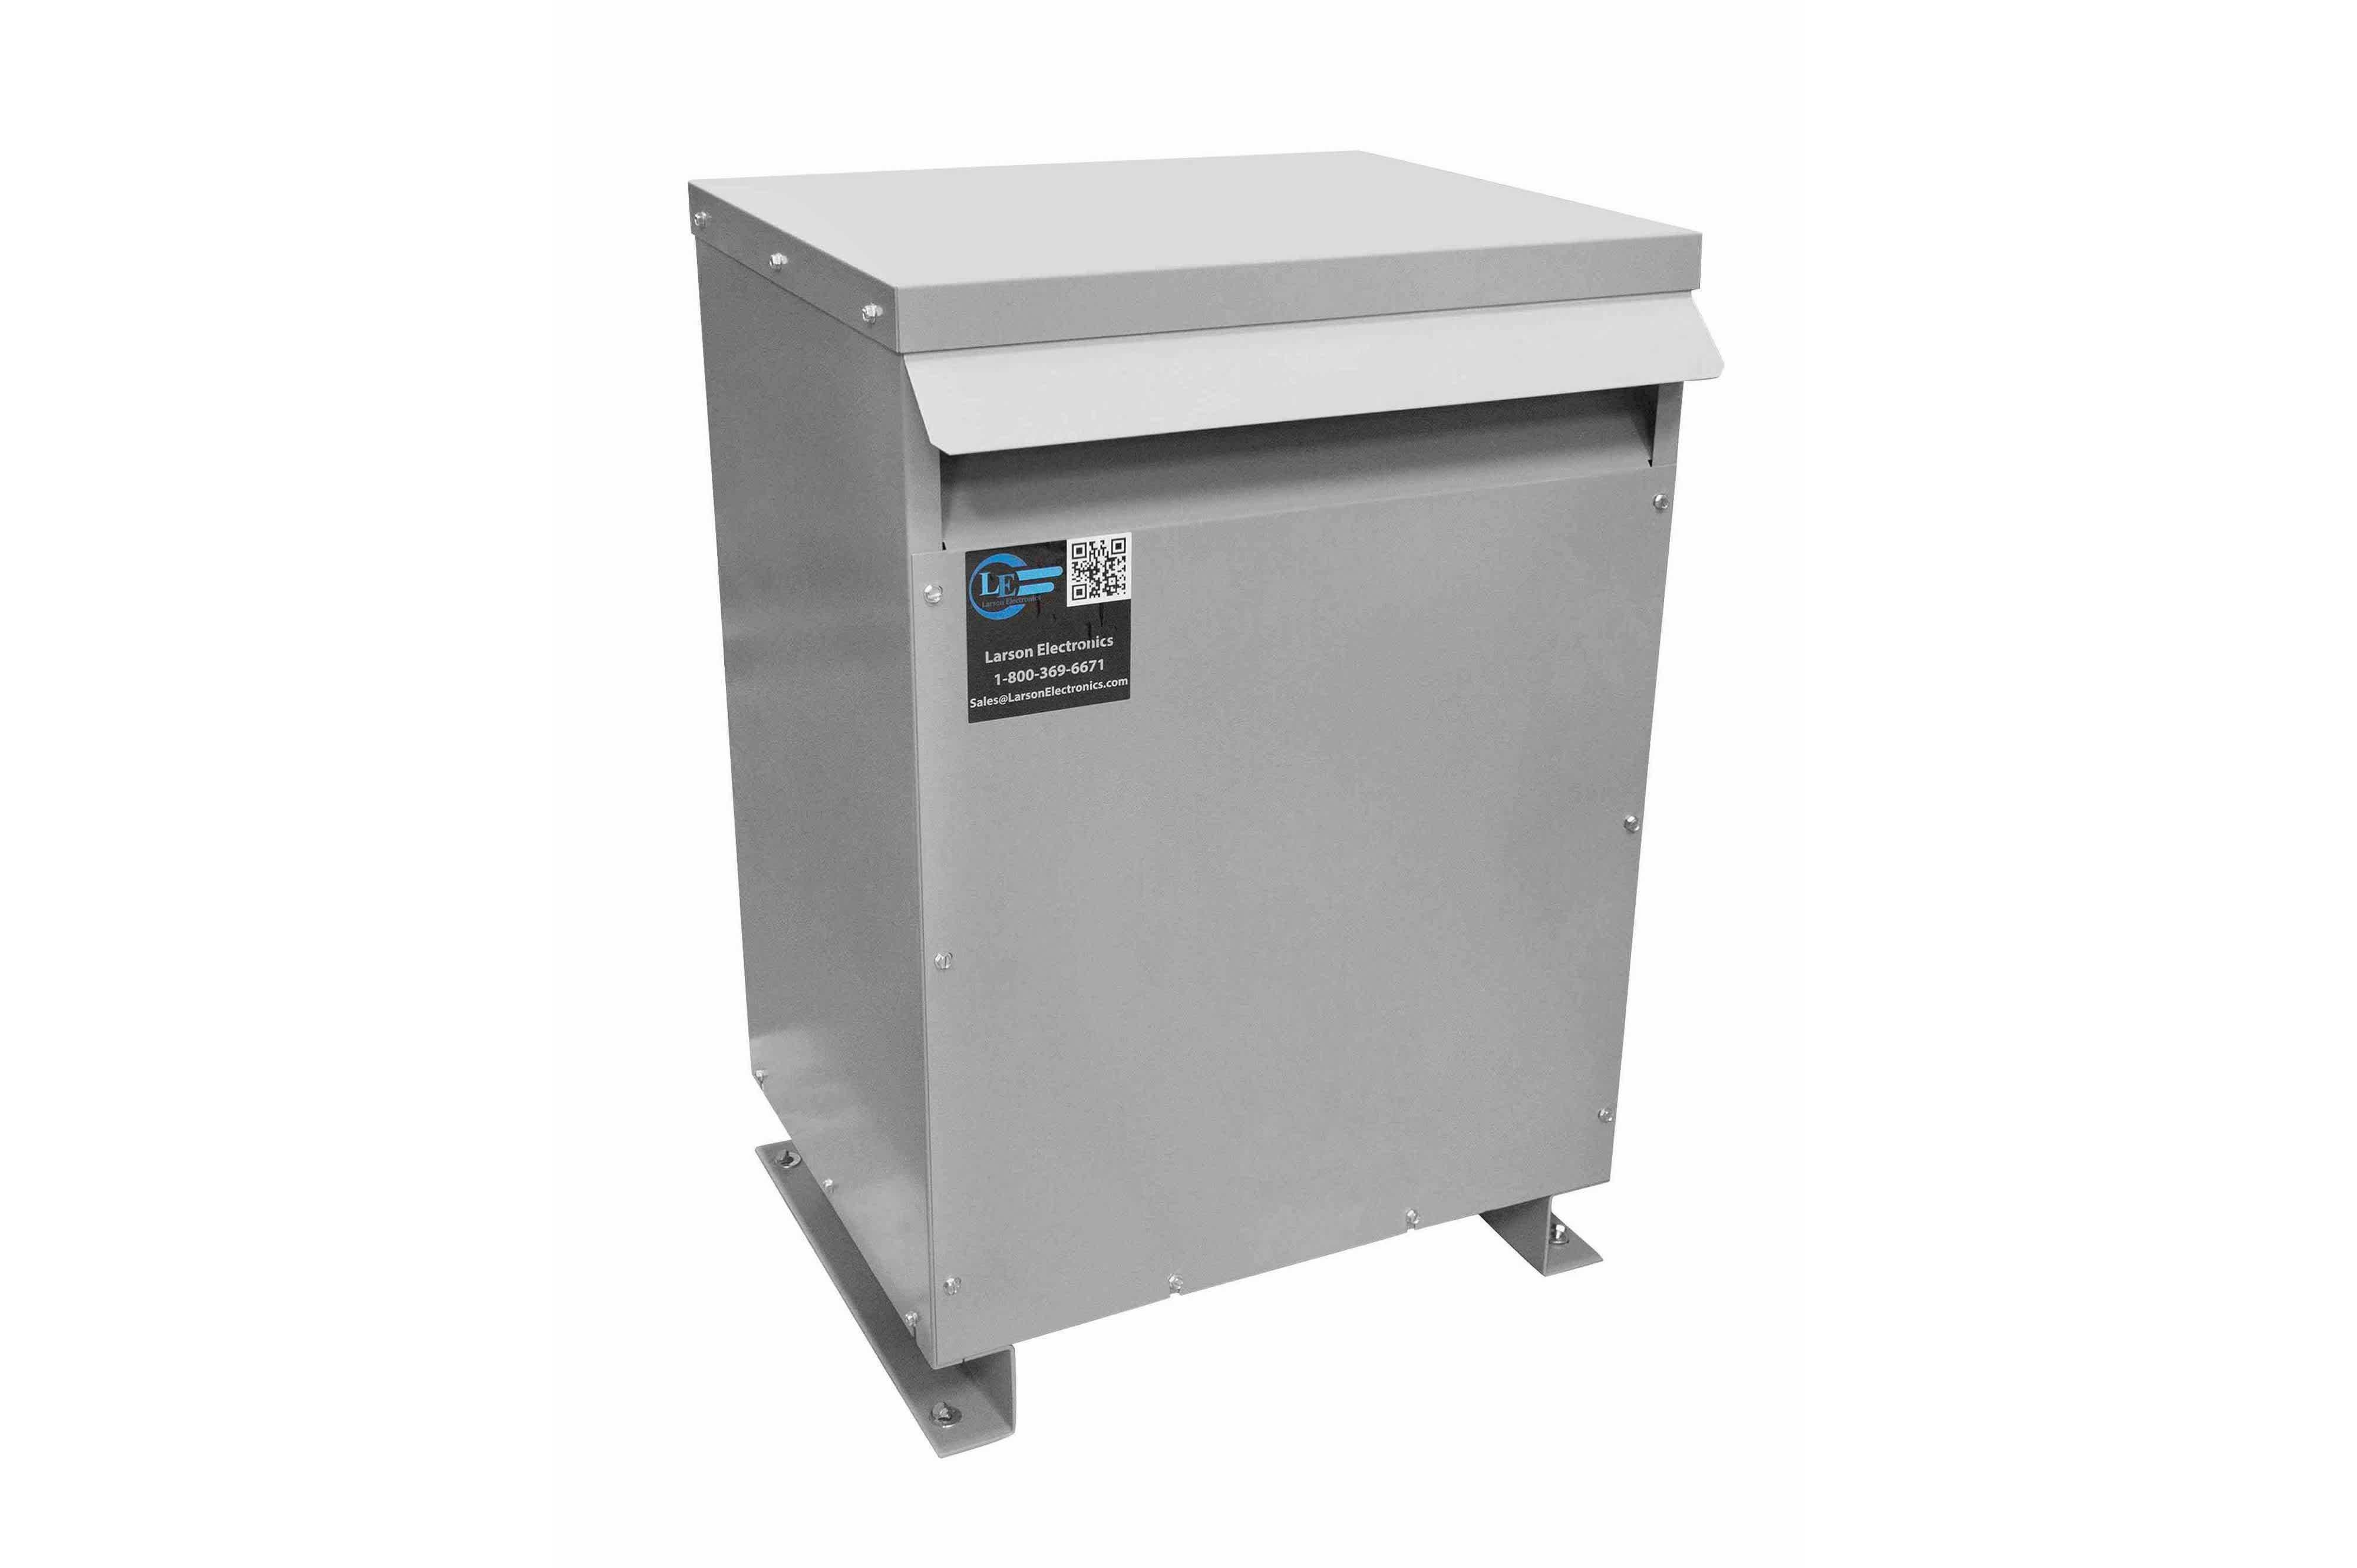 115 kVA 3PH Isolation Transformer, 208V Wye Primary, 400Y/231 Wye-N Secondary, N3R, Ventilated, 60 Hz